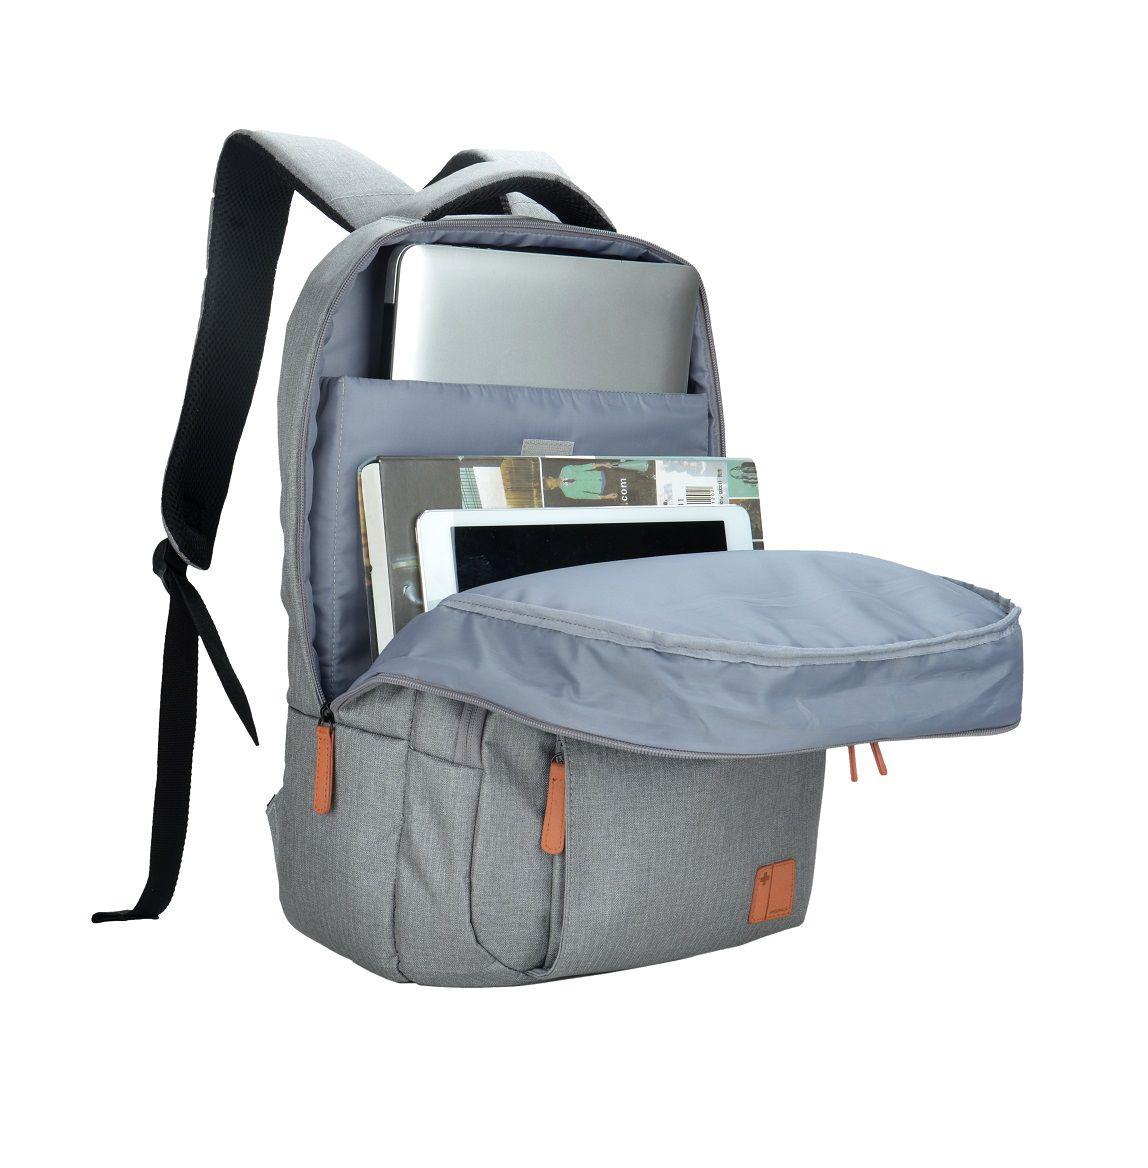 "Mochila Swisspack City Cinza Notebook 15.6"" Multilaser BO418  - Mix Eletro"